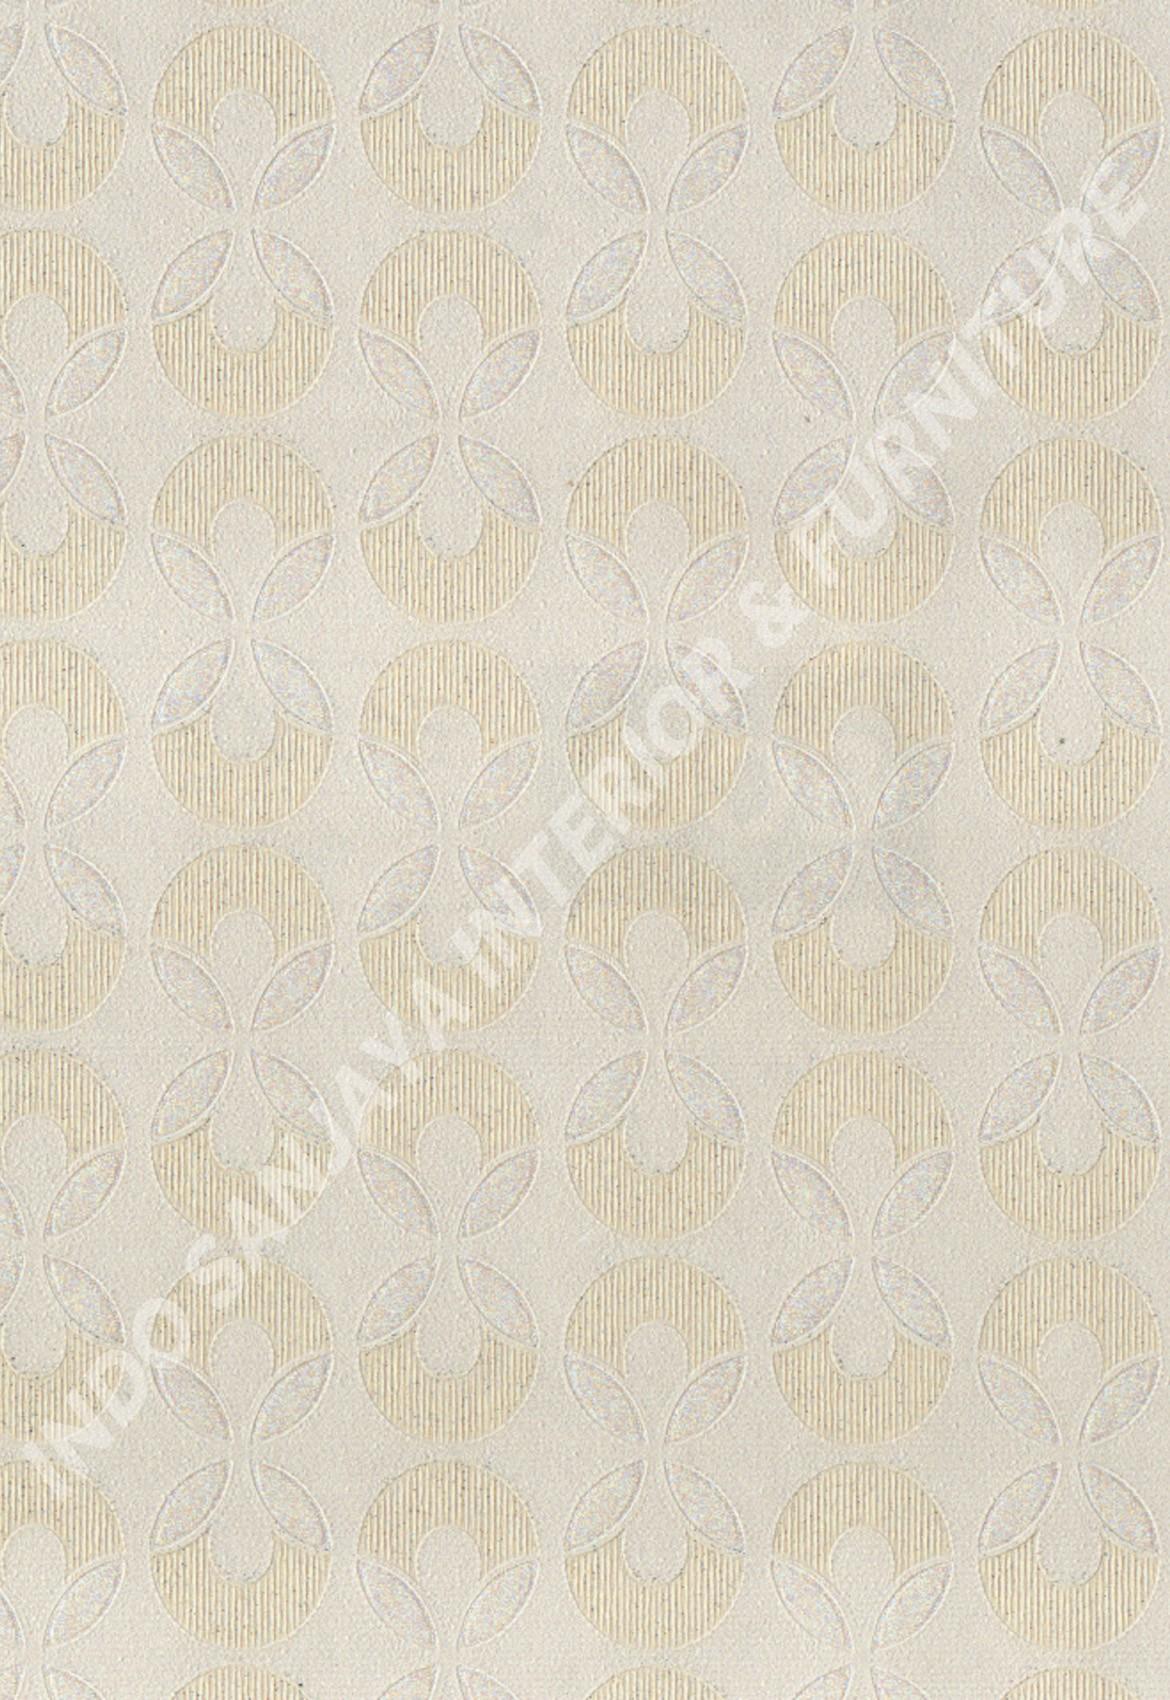 wallpaper   Wallpaper Minimalis Polos E11302:E11302 corak  warna